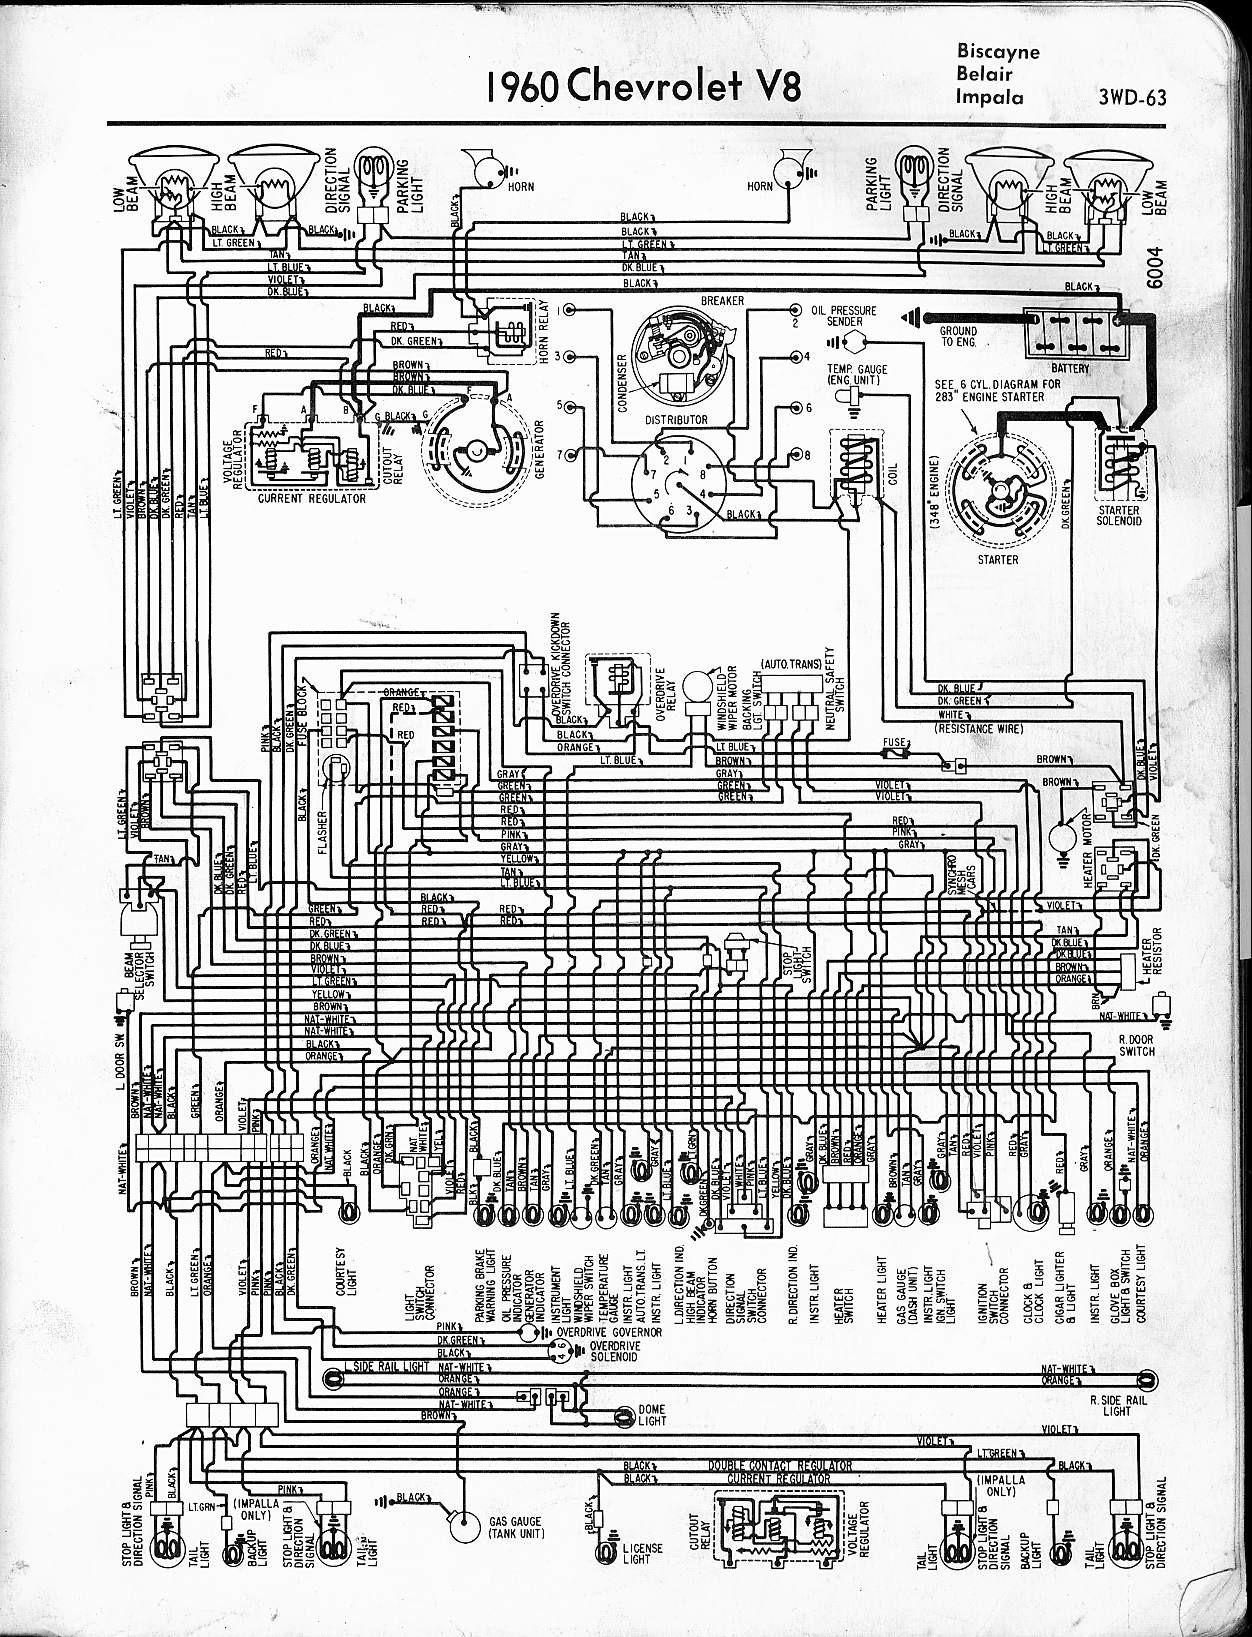 1997 Chevy Malibu Wiring Diagram | Wiring Liry on 4 wire chevy alternator wiring diagram, 2008 chevy malibu wiring diagram, 2004 chevy truck wiring diagram, 2003 chevy malibu wiring diagram, 1989 chevy alternator wiring diagram, 2002 chevy malibu wiring diagram, 1998 chevy malibu wiring diagram, 1997 chevy malibu steering, 2007 chevy malibu wiring diagram, 1997 chevy malibu fuse box diagram, chevy truck steering column wiring diagram, chevy lumina water pump diagram, 1999 chevy malibu wiring diagram, 1997 chevy malibu air conditioning, 1997 chevy malibu owner's manual, 2005 gm power seat wiring diagram, 2001 chevy malibu wiring diagram, 2005 chevy malibu wiring diagram, 2000 chevy malibu wiring diagram, 2004 chevy malibu wiring diagram,